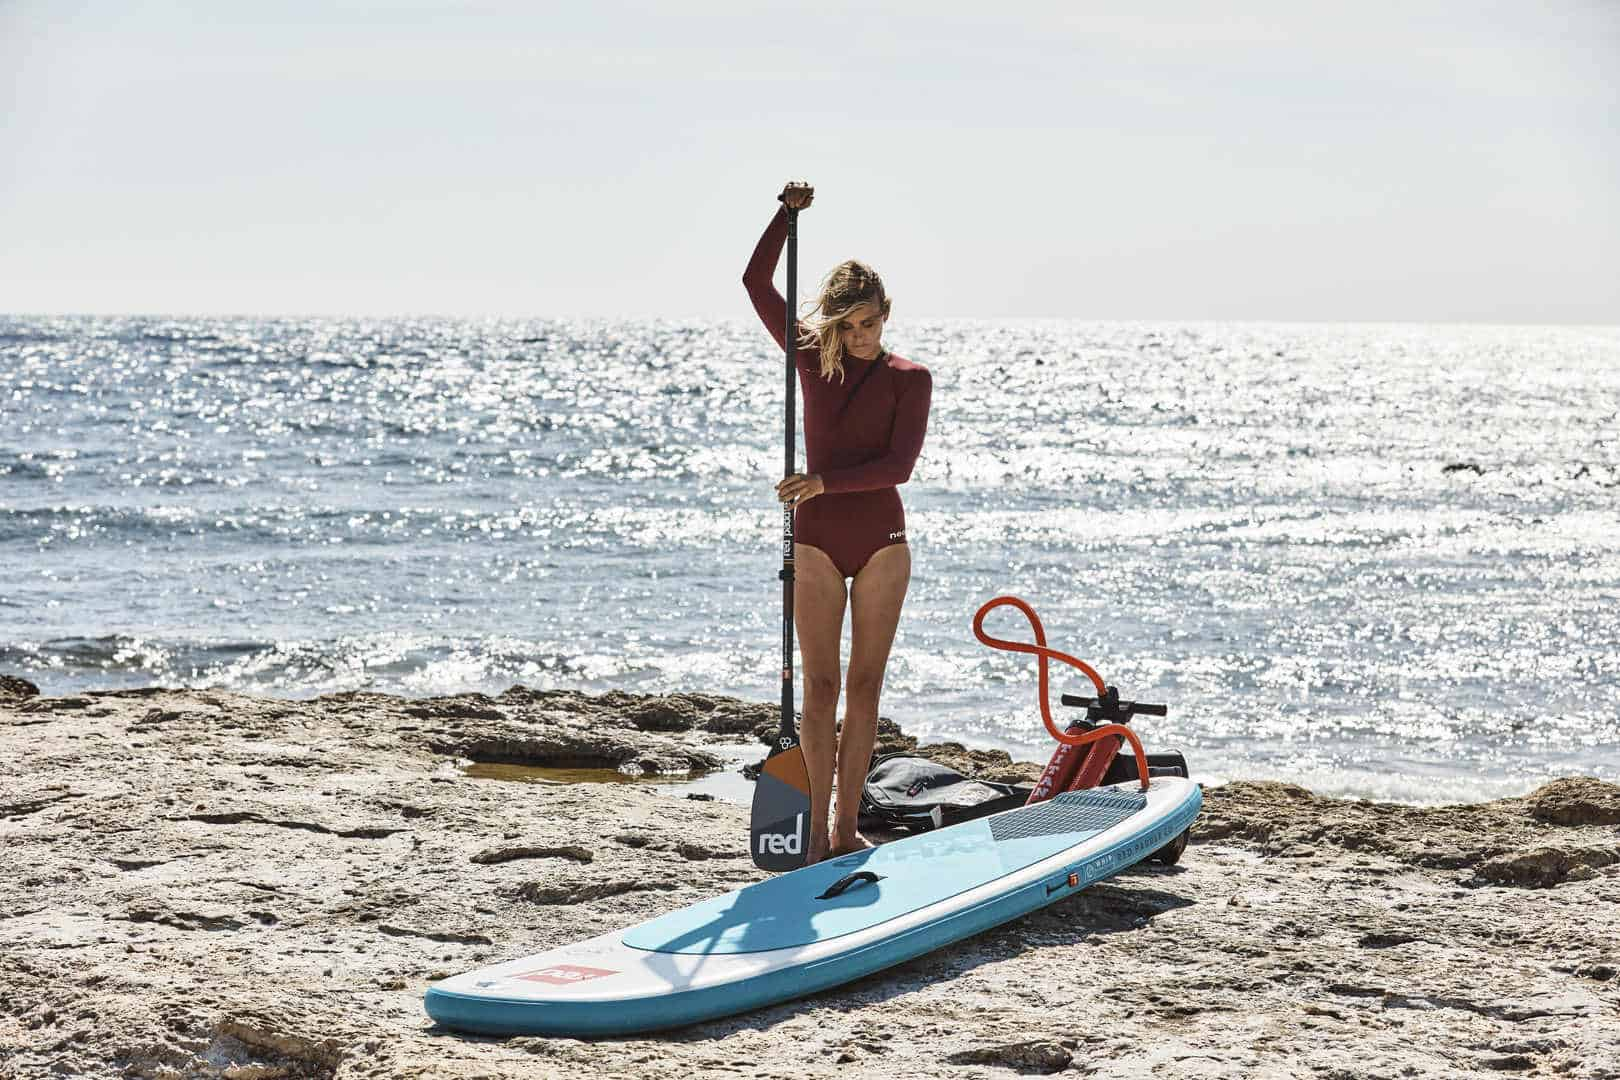 comprar-paddle-surf-segunda-mano